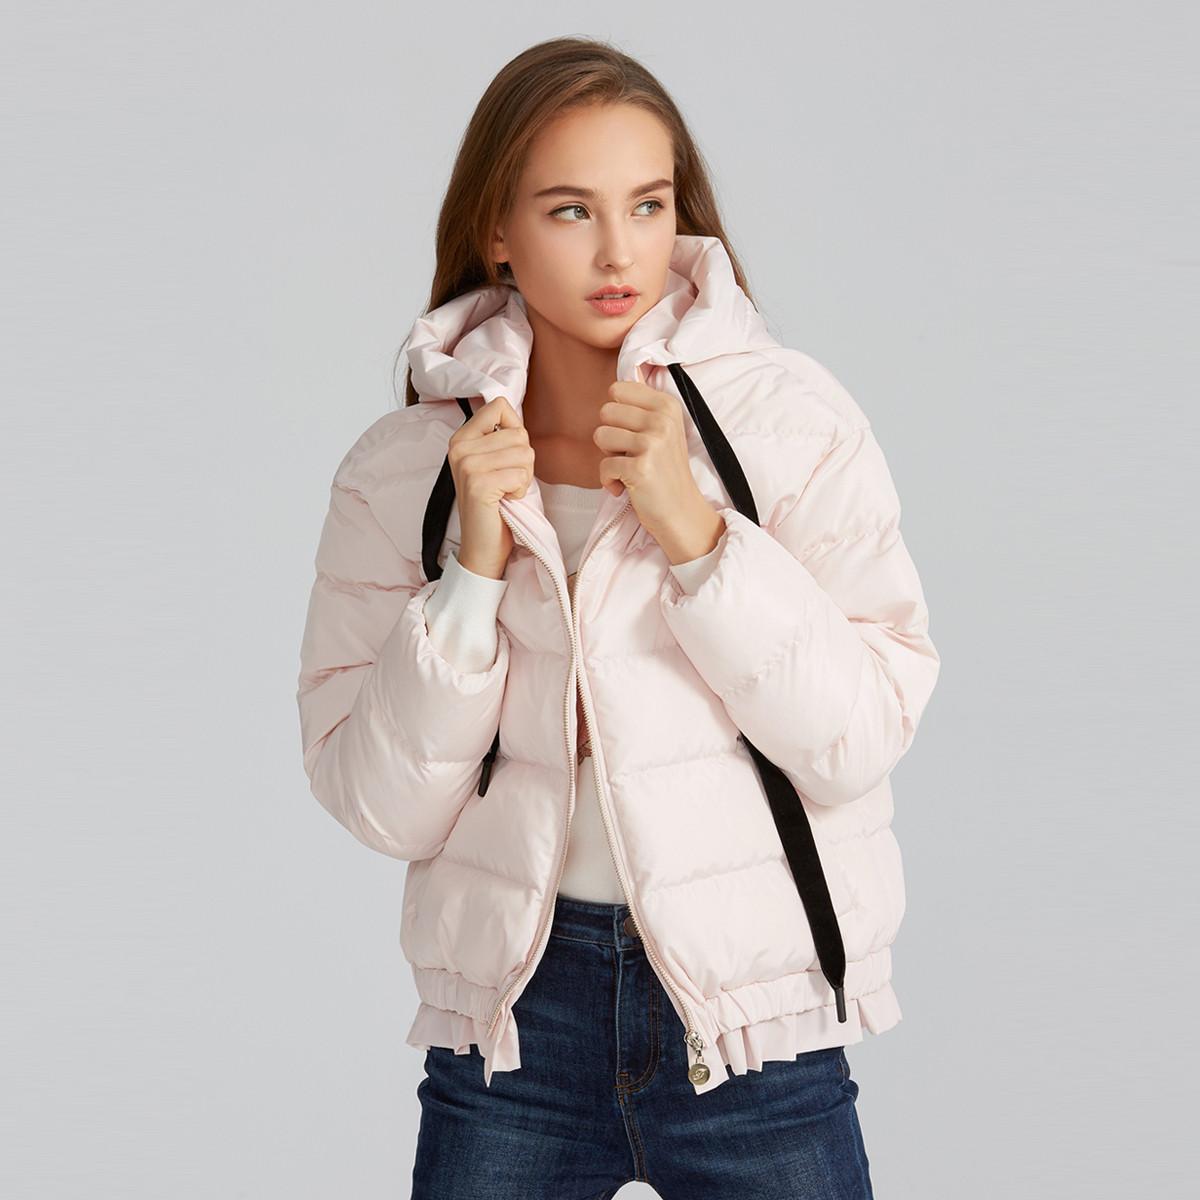 FIVE PLUSFive Plus2019新款女春装连帽夹棉外套女宽松棉服荷叶边长袖chic2ZN1040060180